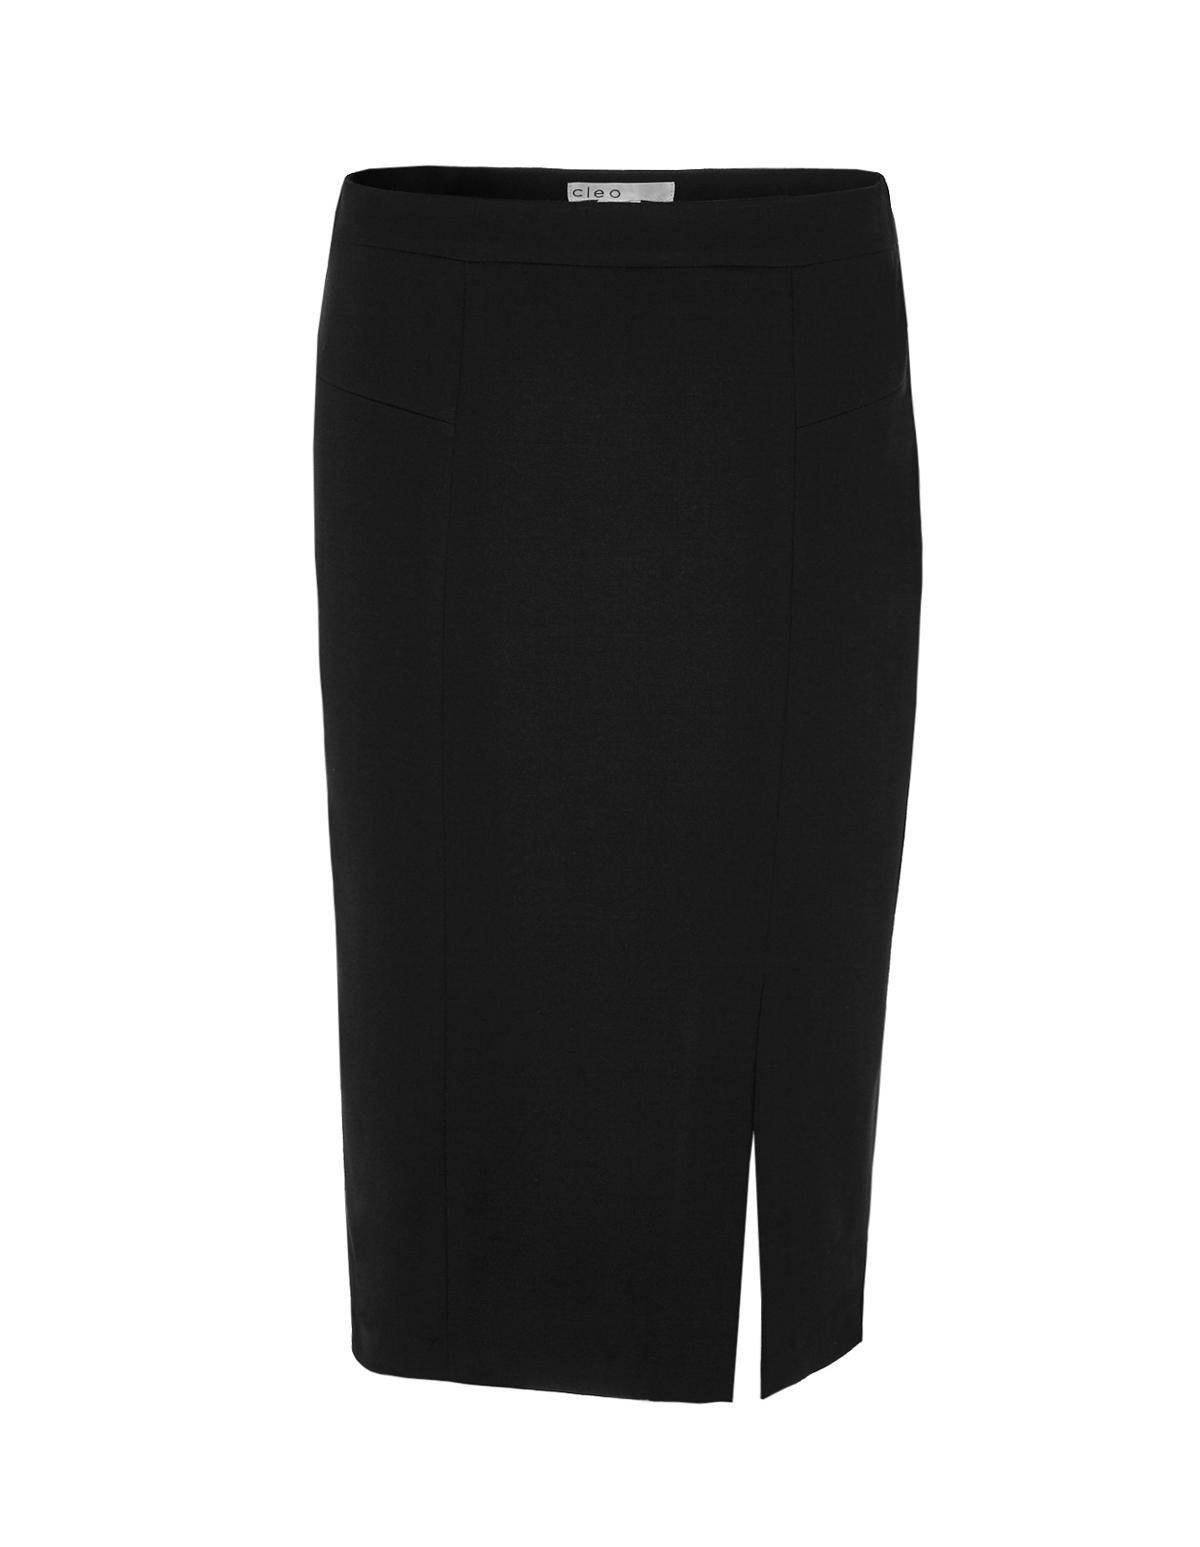 Pull-On Mid Length Pencil Skirt | Cleo